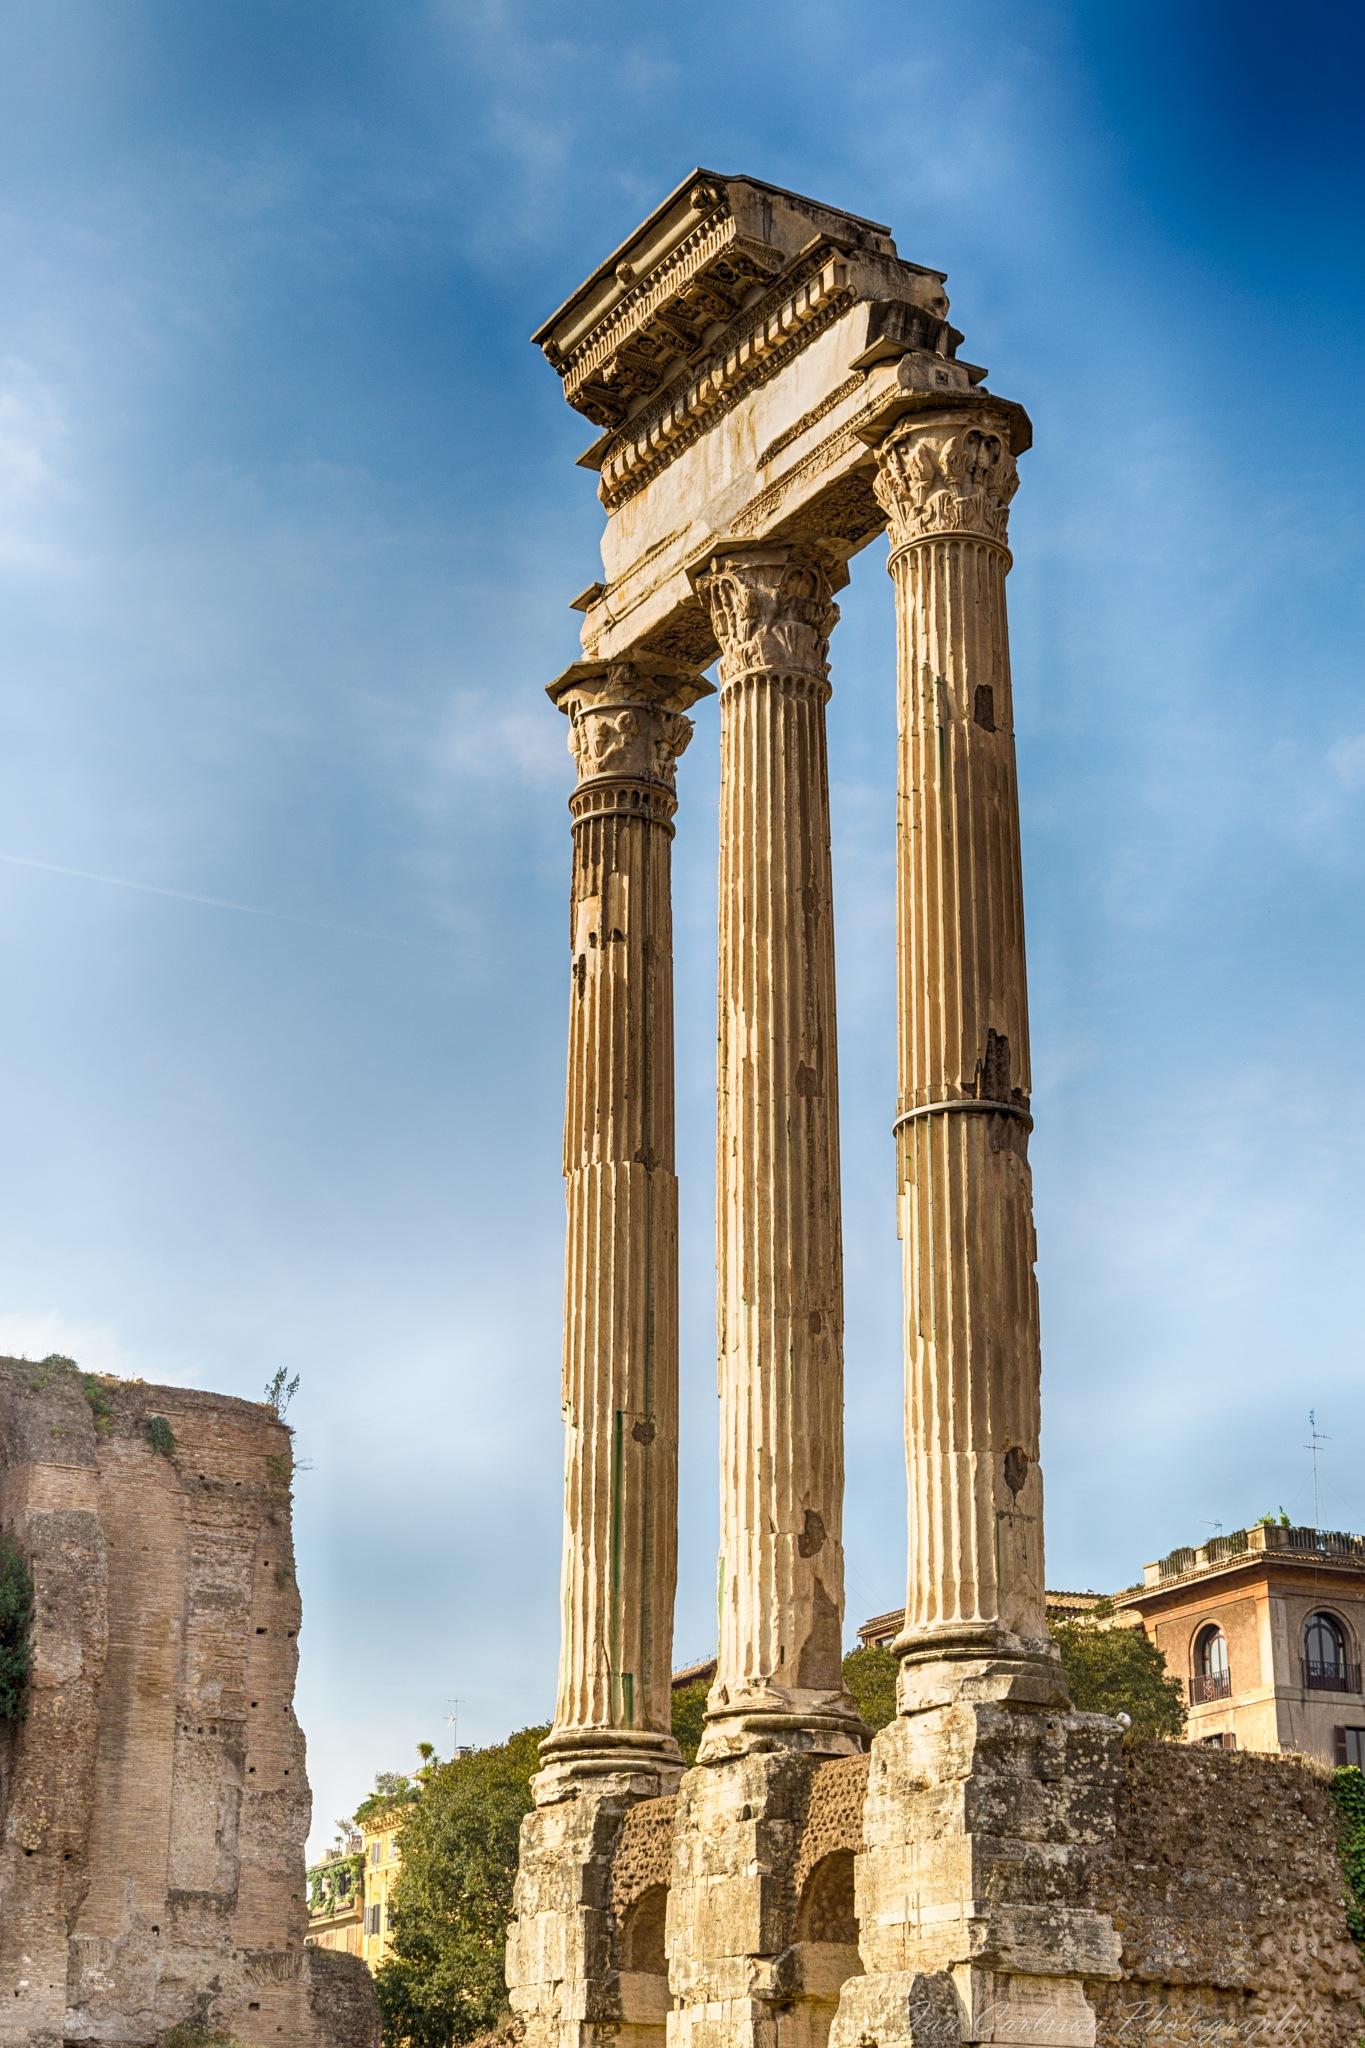 Ancient Rome Palatine Hill by carljan w carlsson